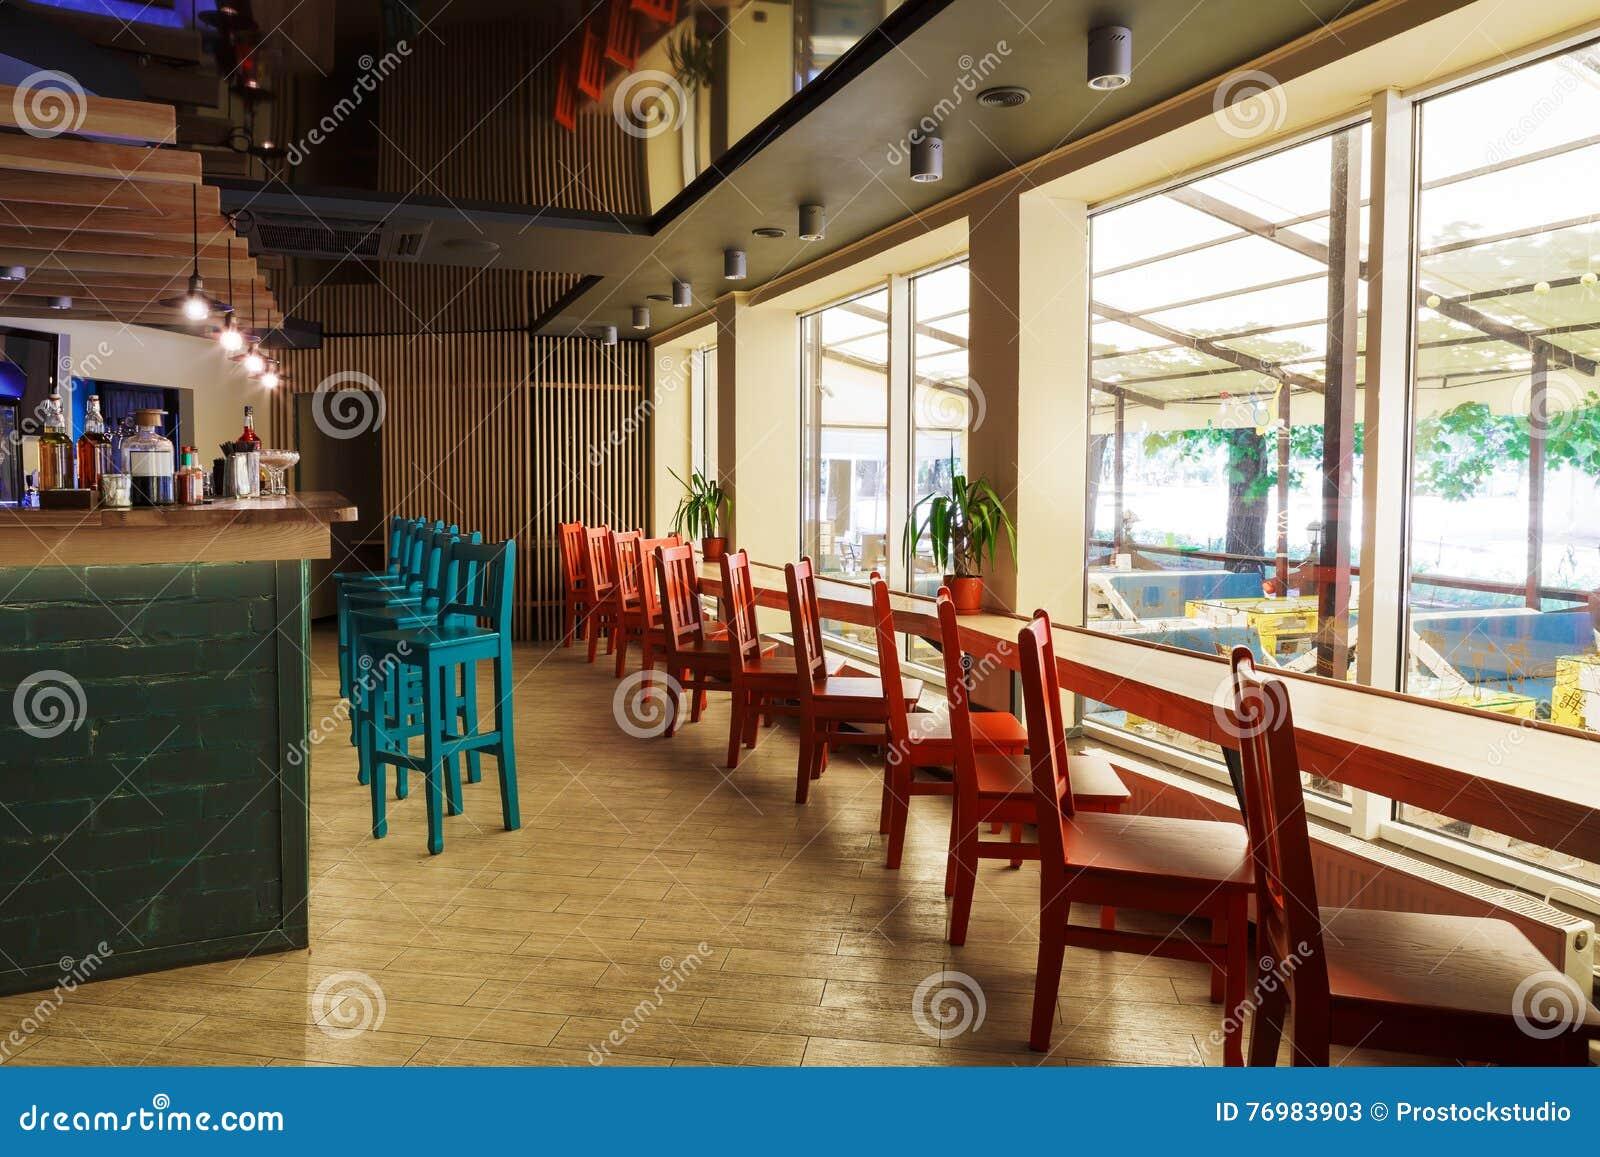 Modern Restaurant Bar Or Cafe Interior Stock Image Image Of Hotel Atmosphere 76983903